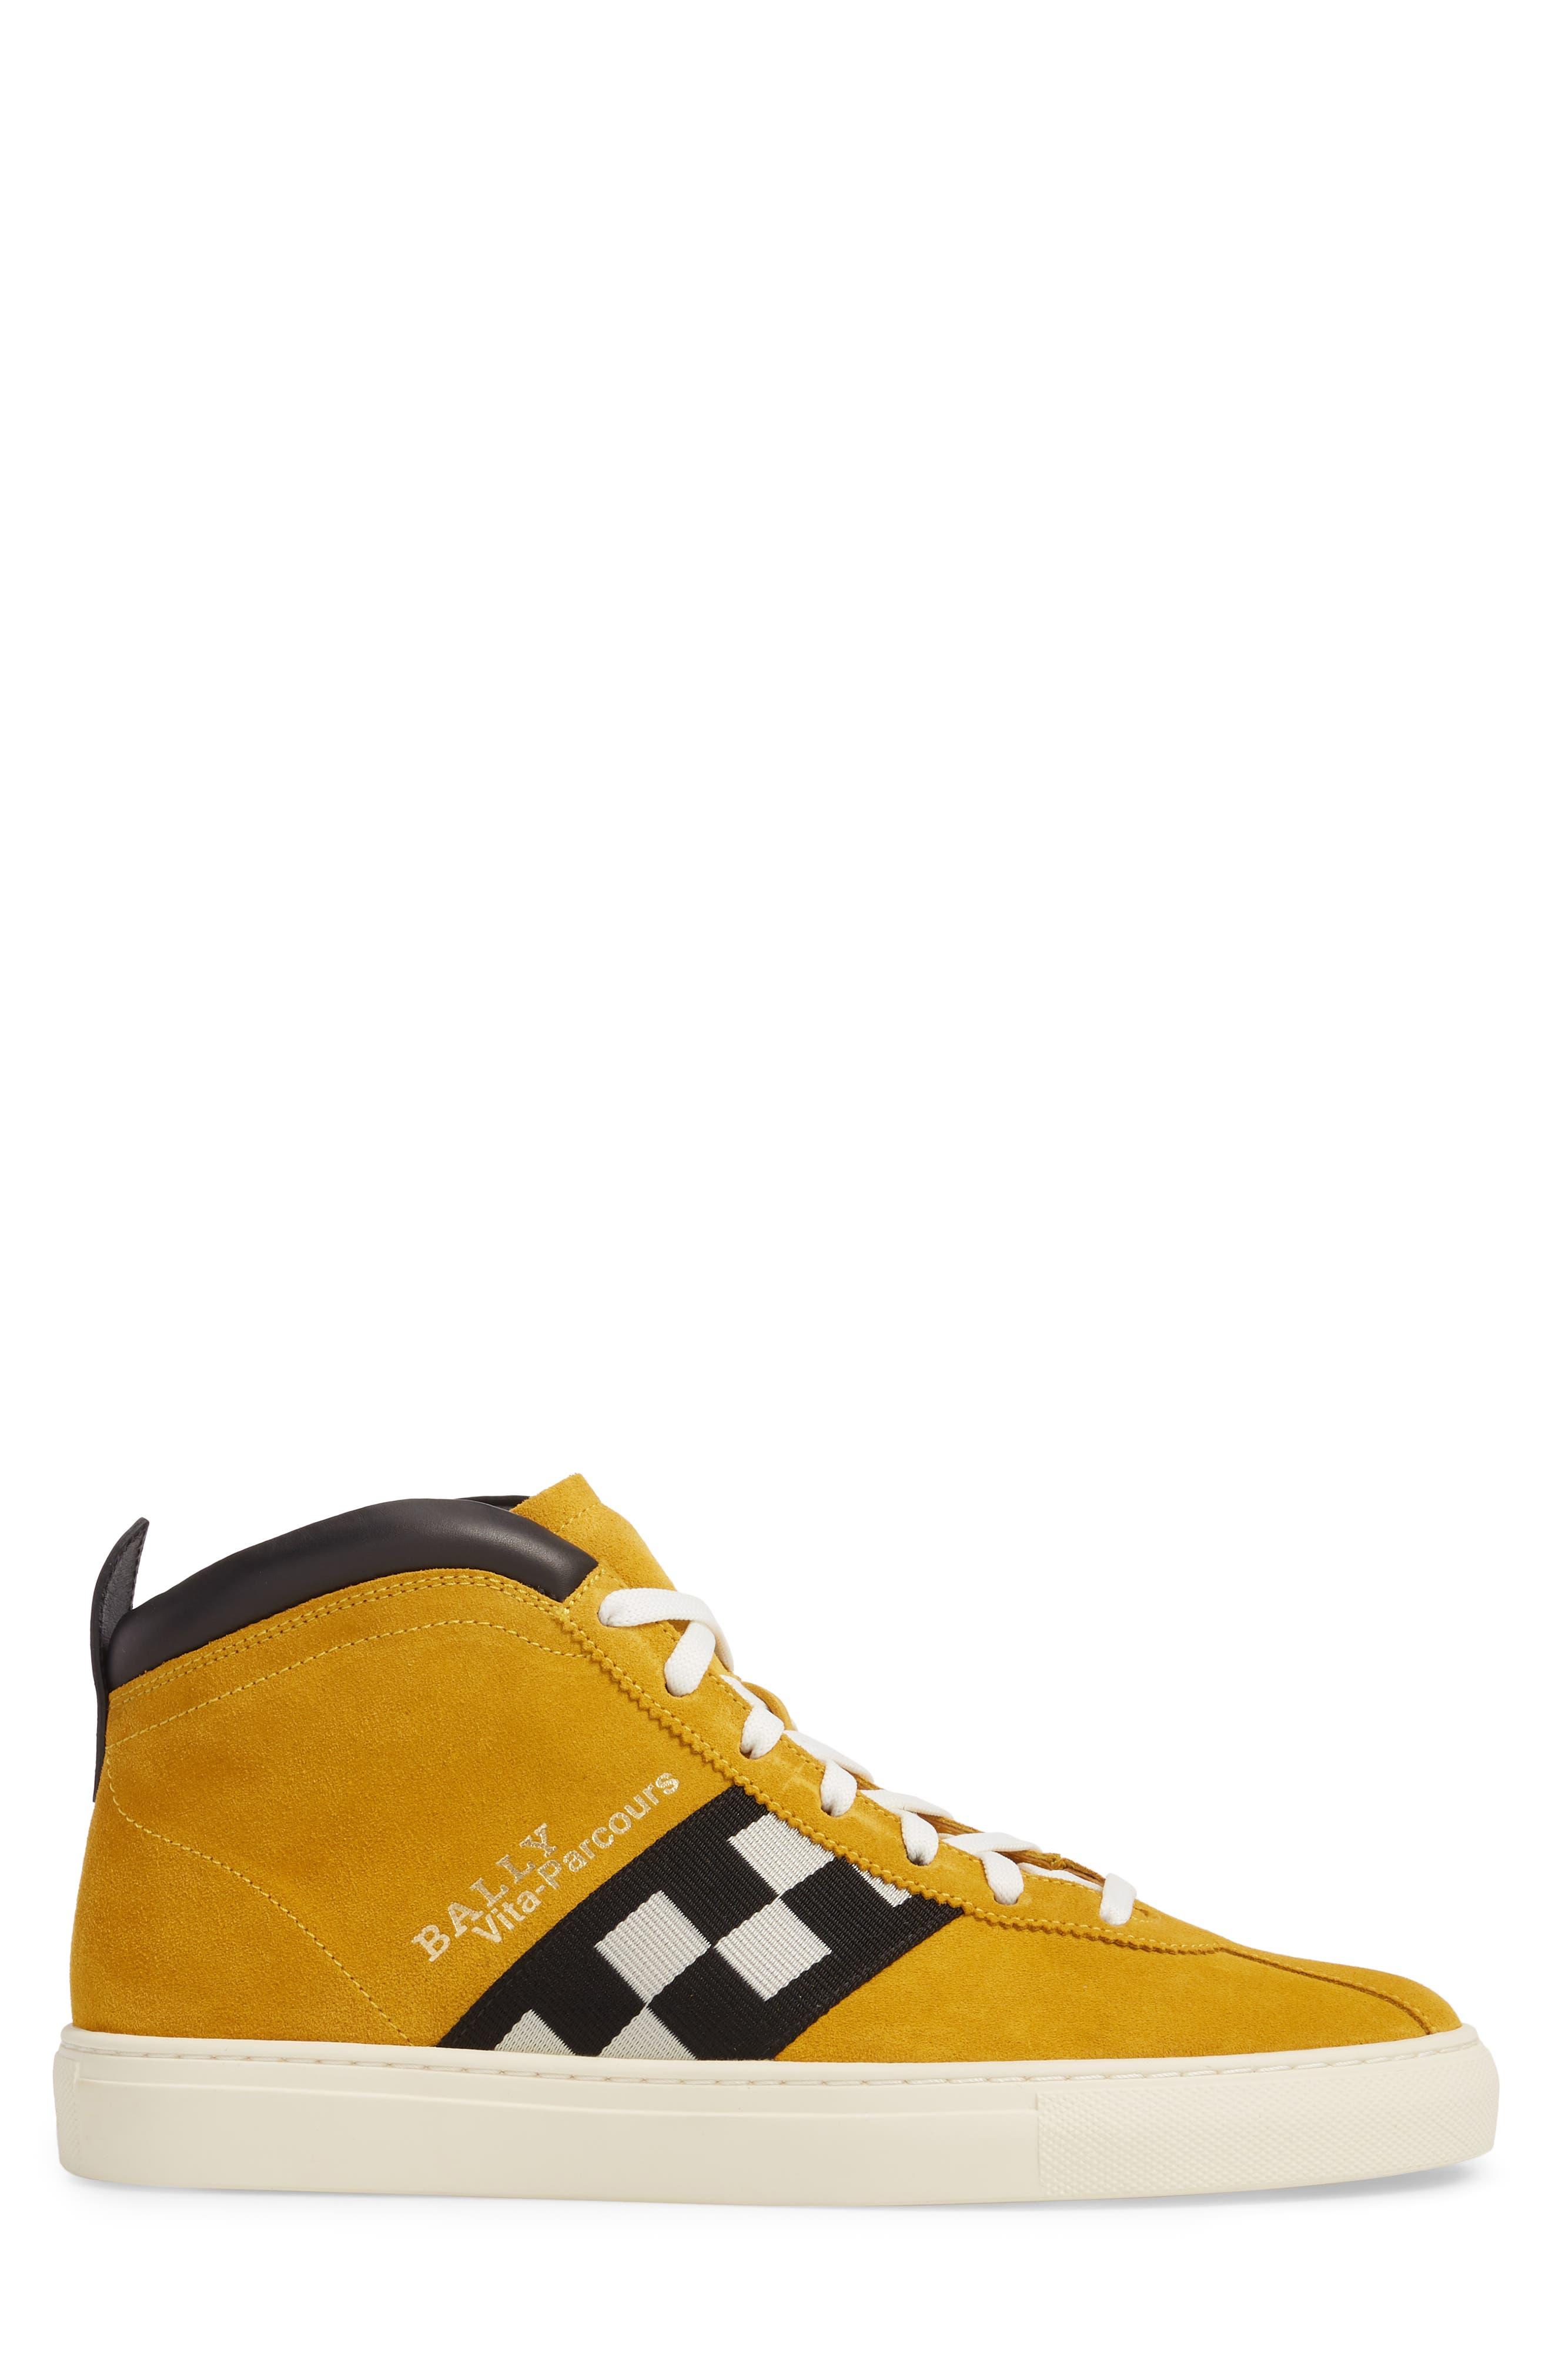 Alternate Image 3  - Bally Vita Checkered High Top Sneaker (Men)